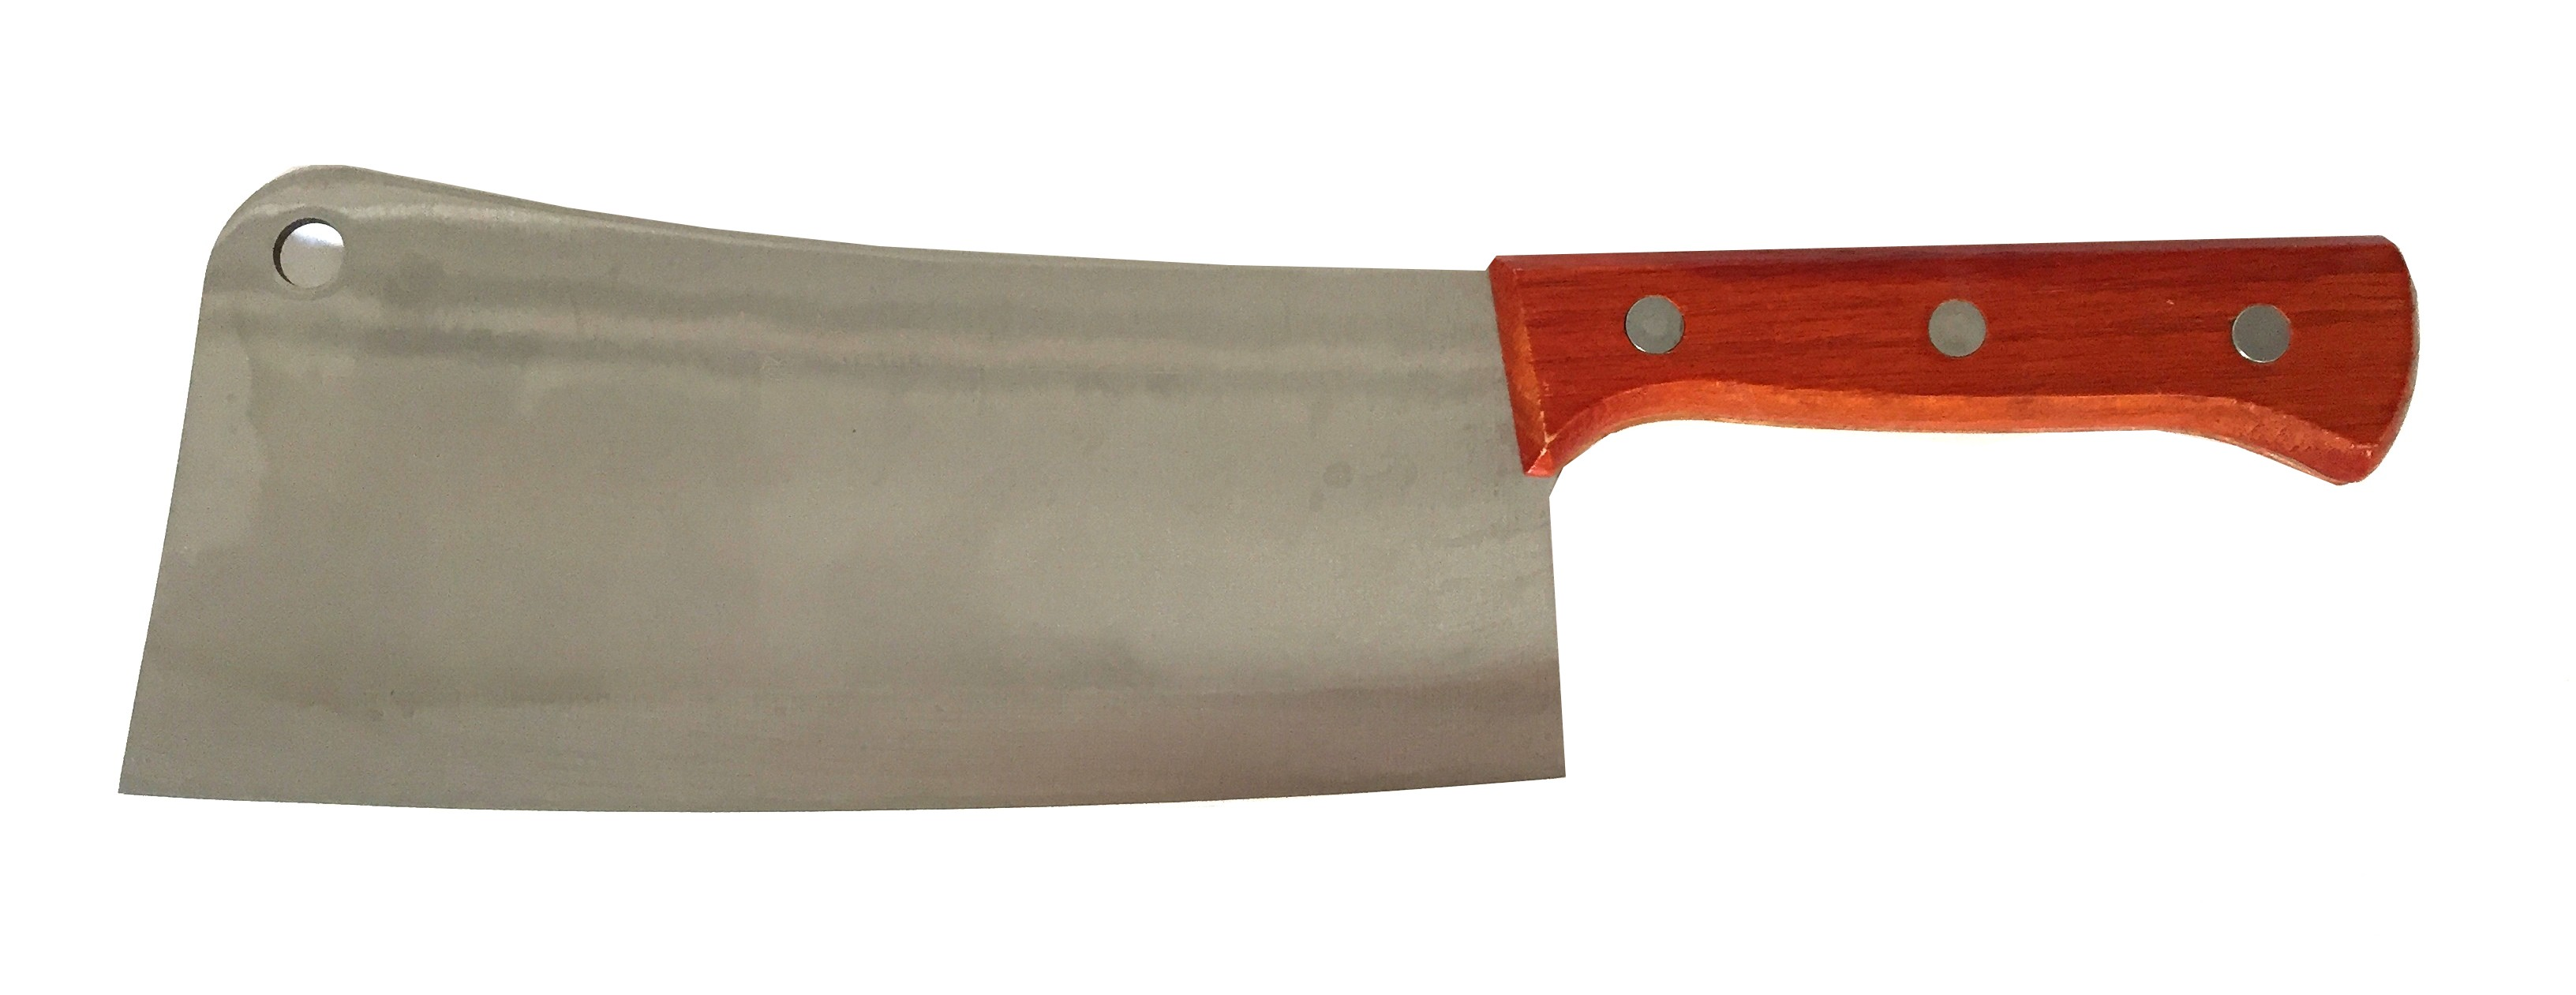 IMG-3715